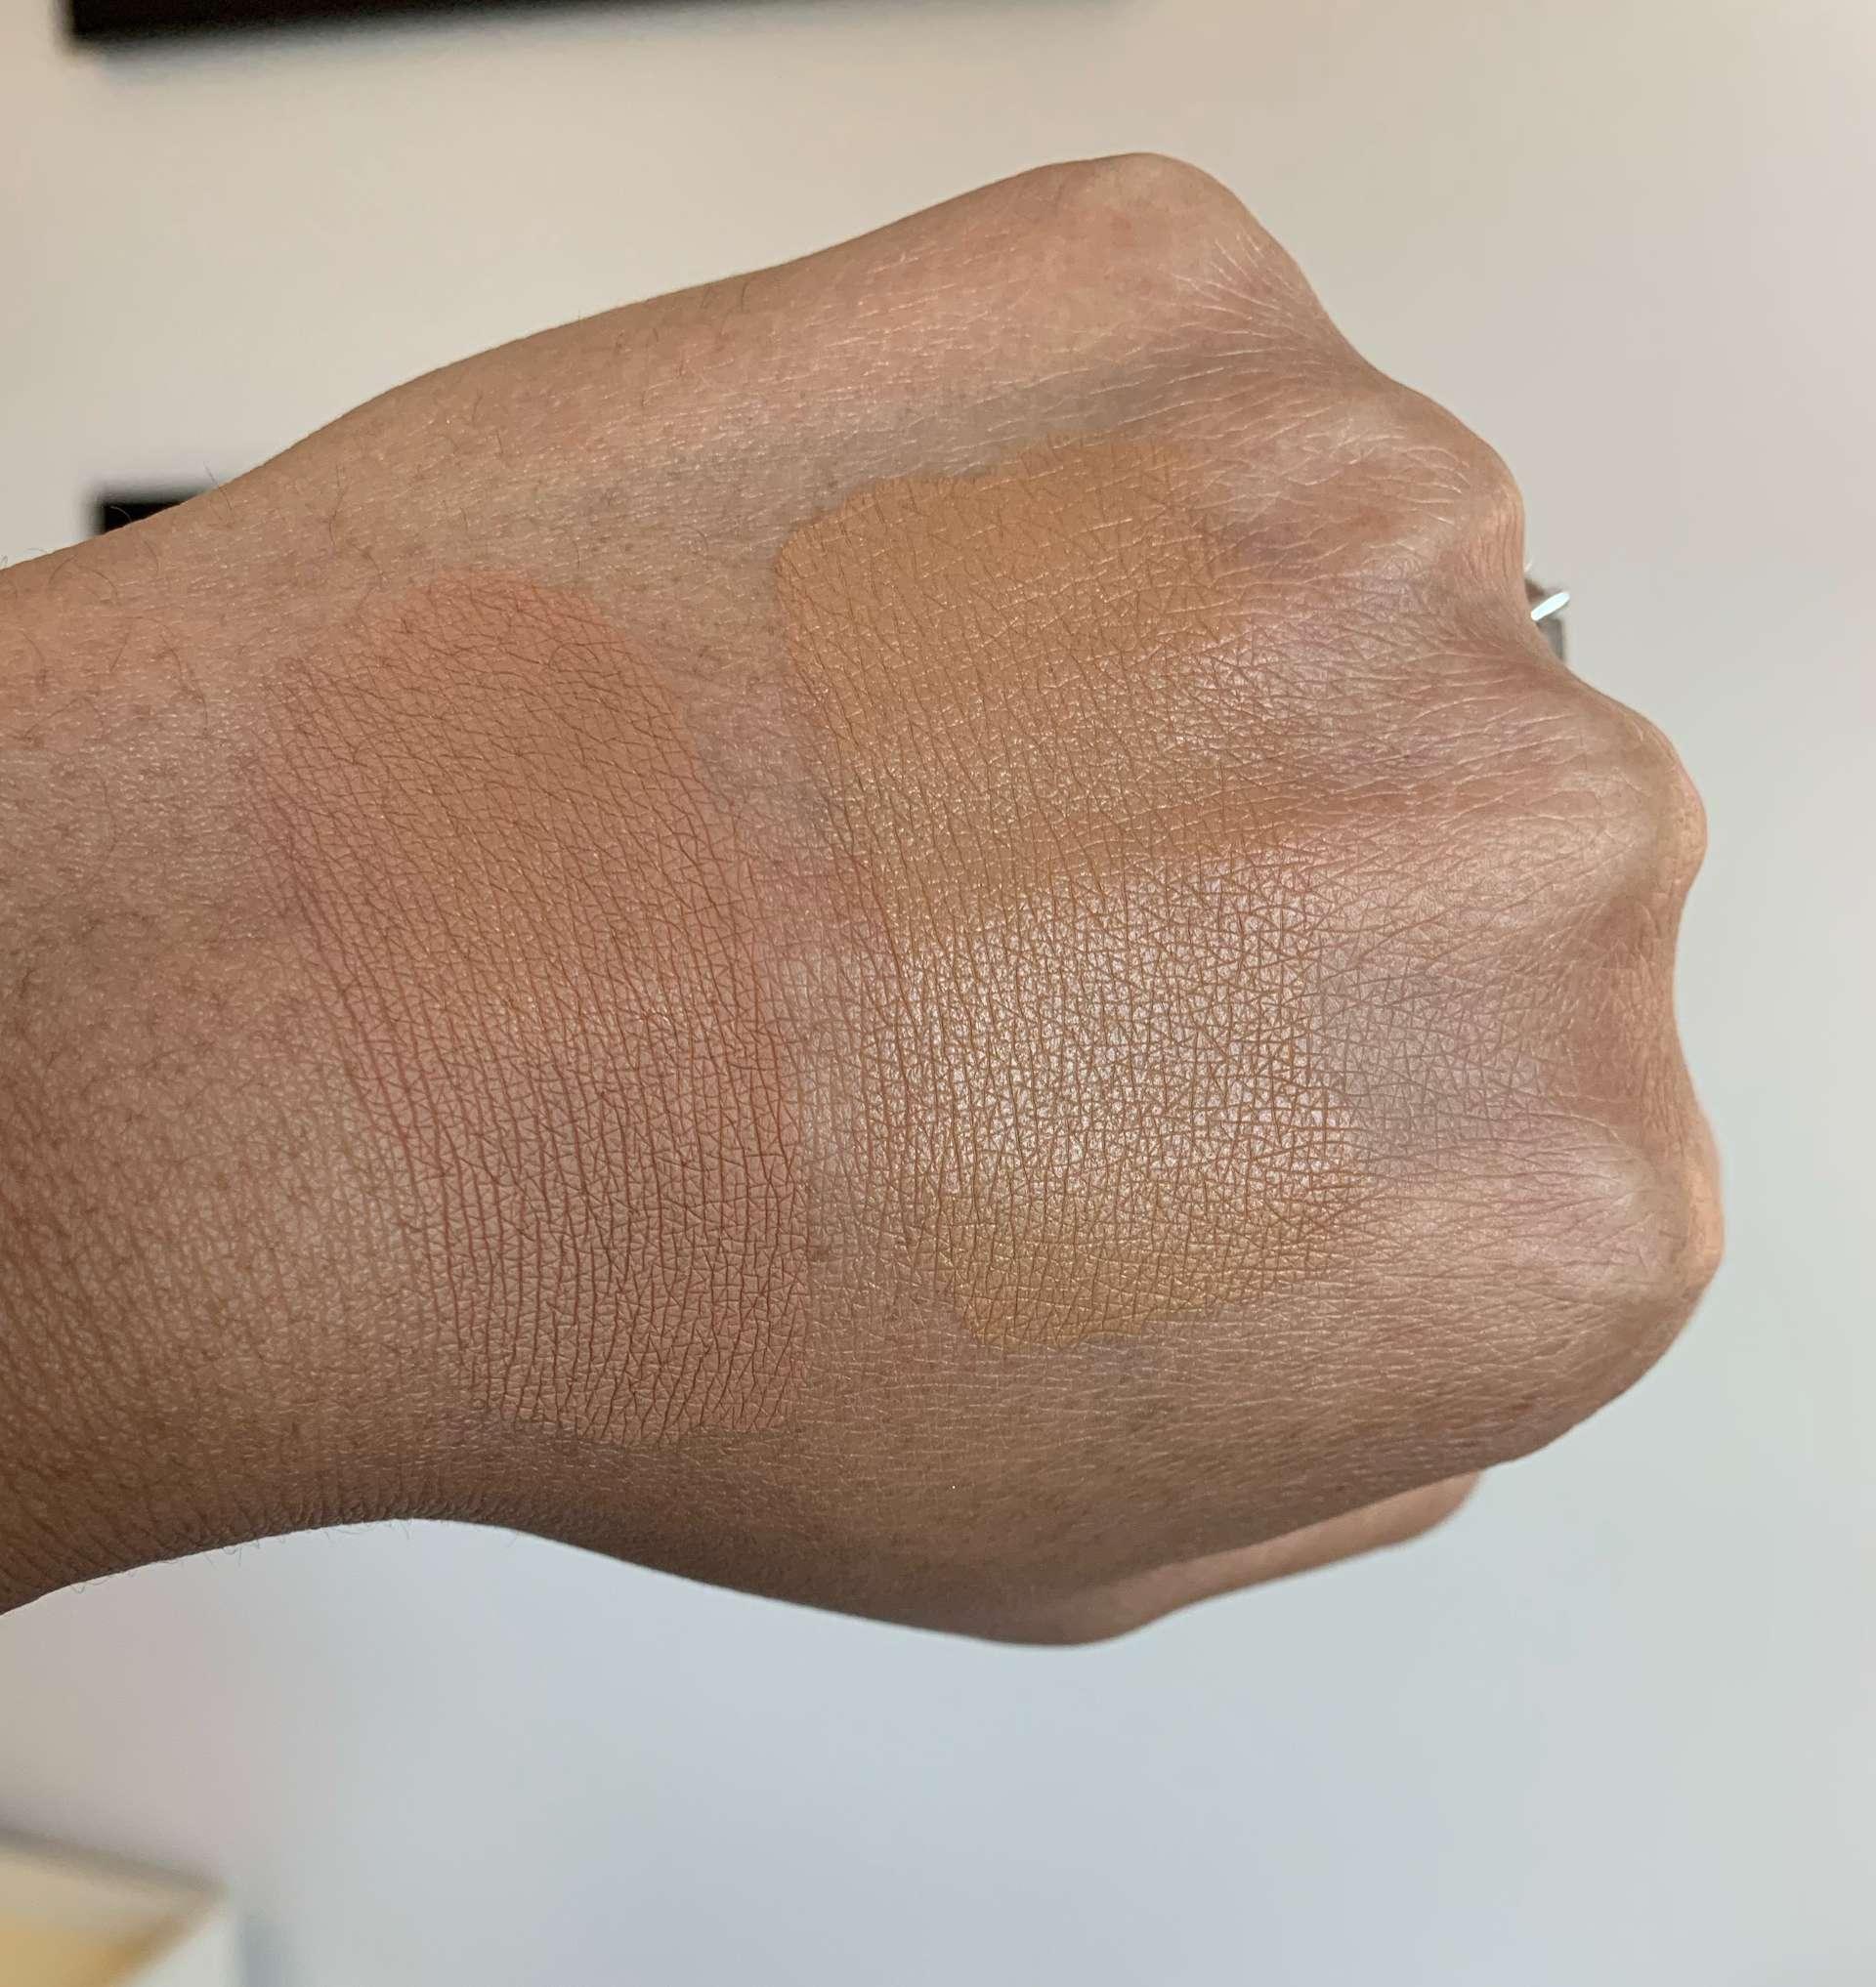 Estee Lauder double wear shade 5w2 rich caramel and nars natural radiant longwear shade tahoe swatches on medium dark skin